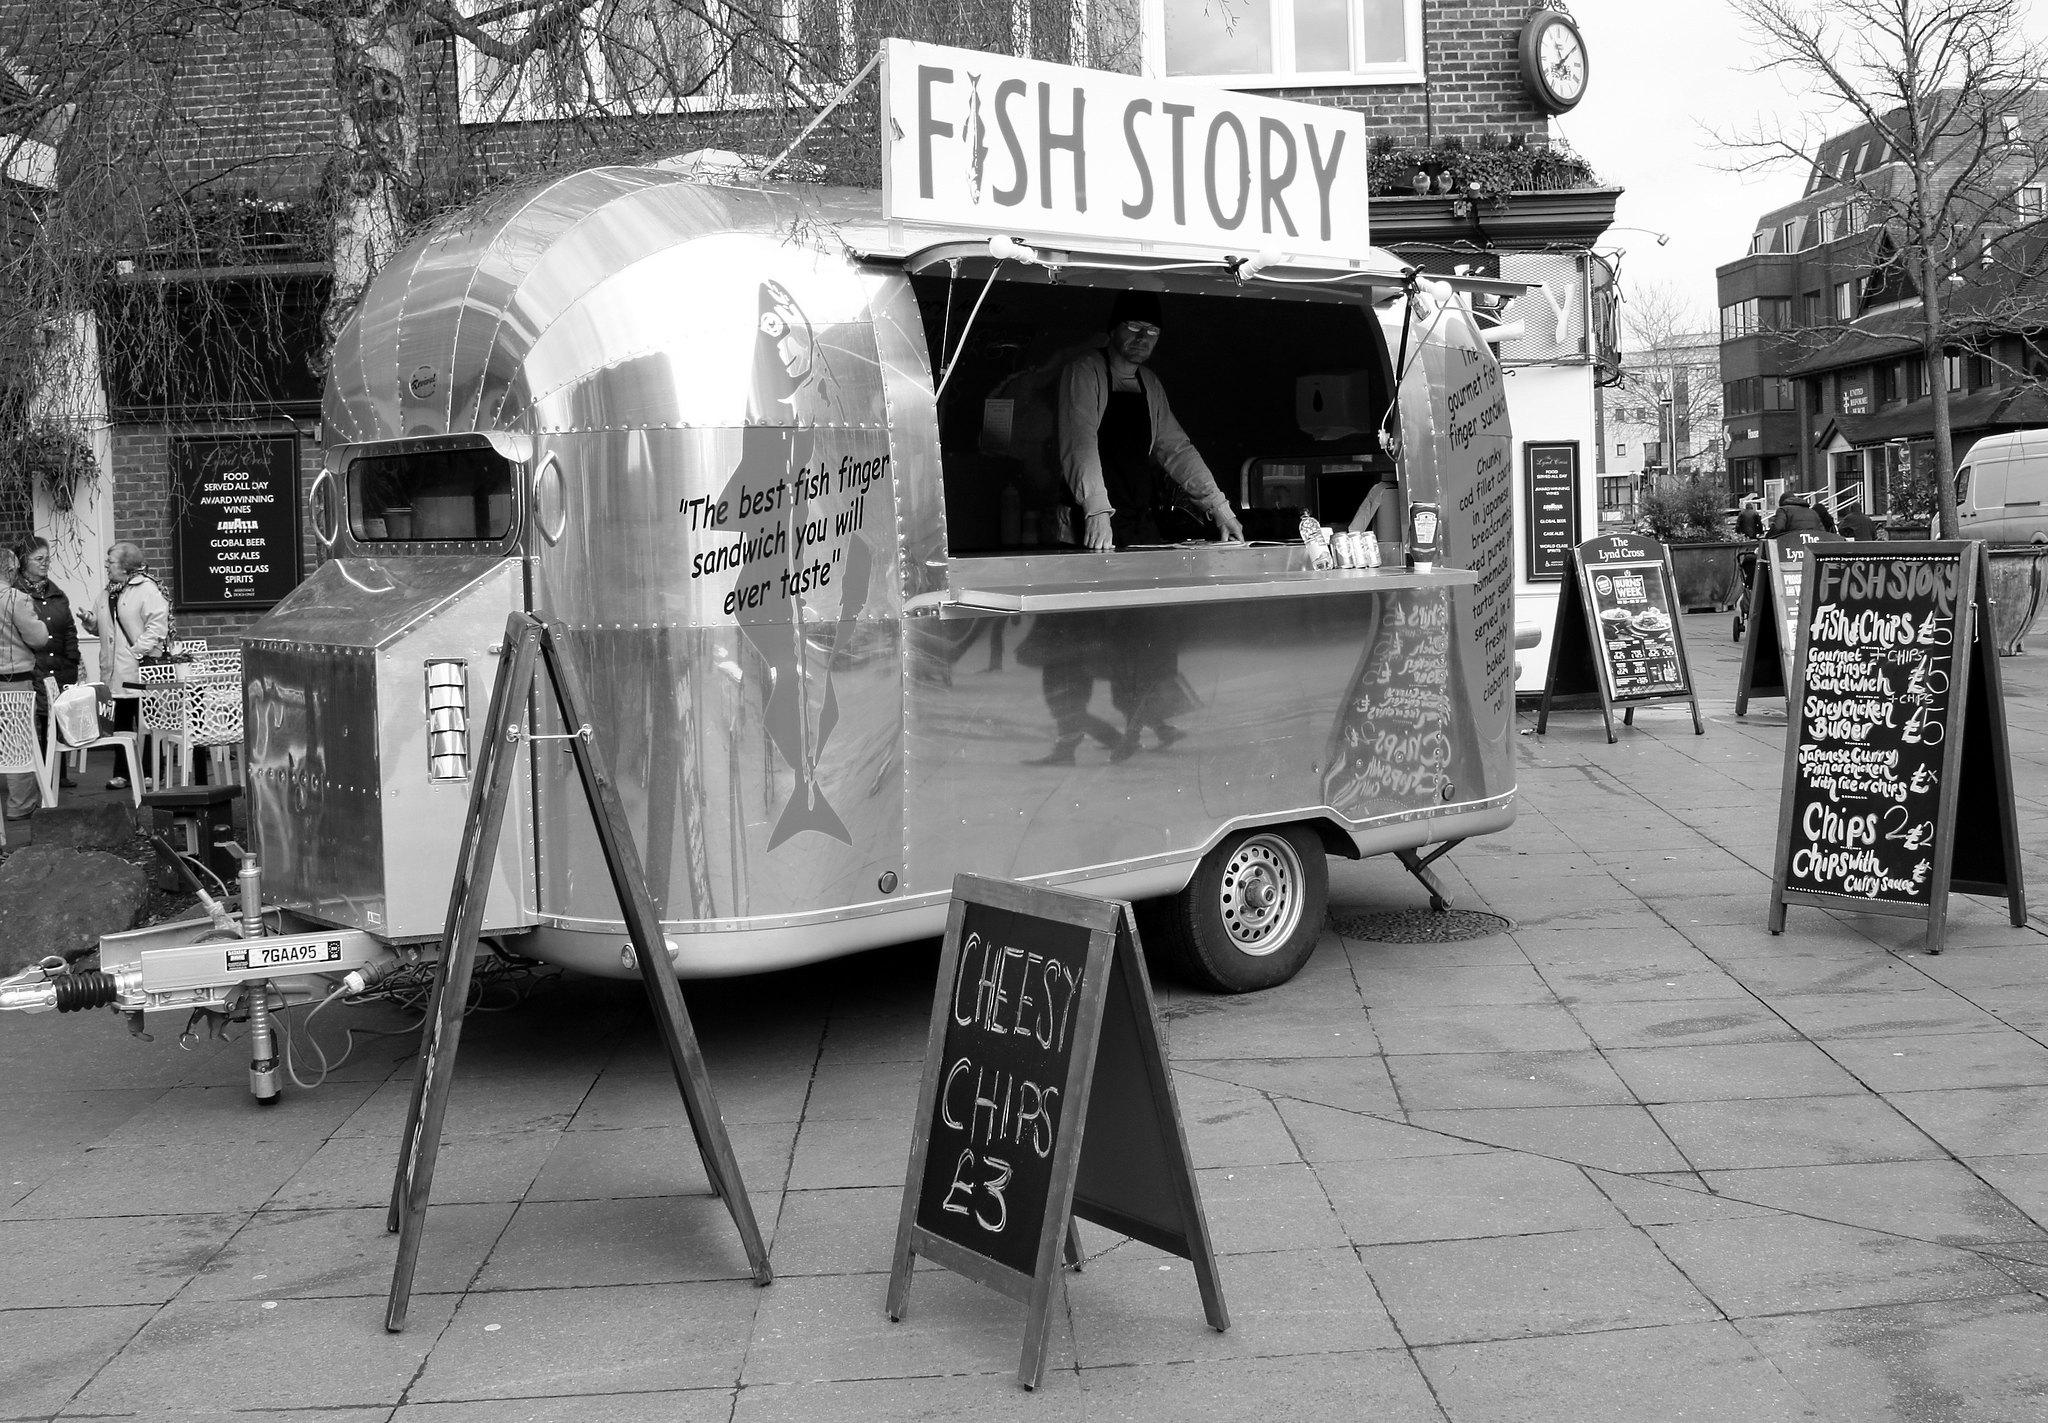 'Fish Story' in Horsham